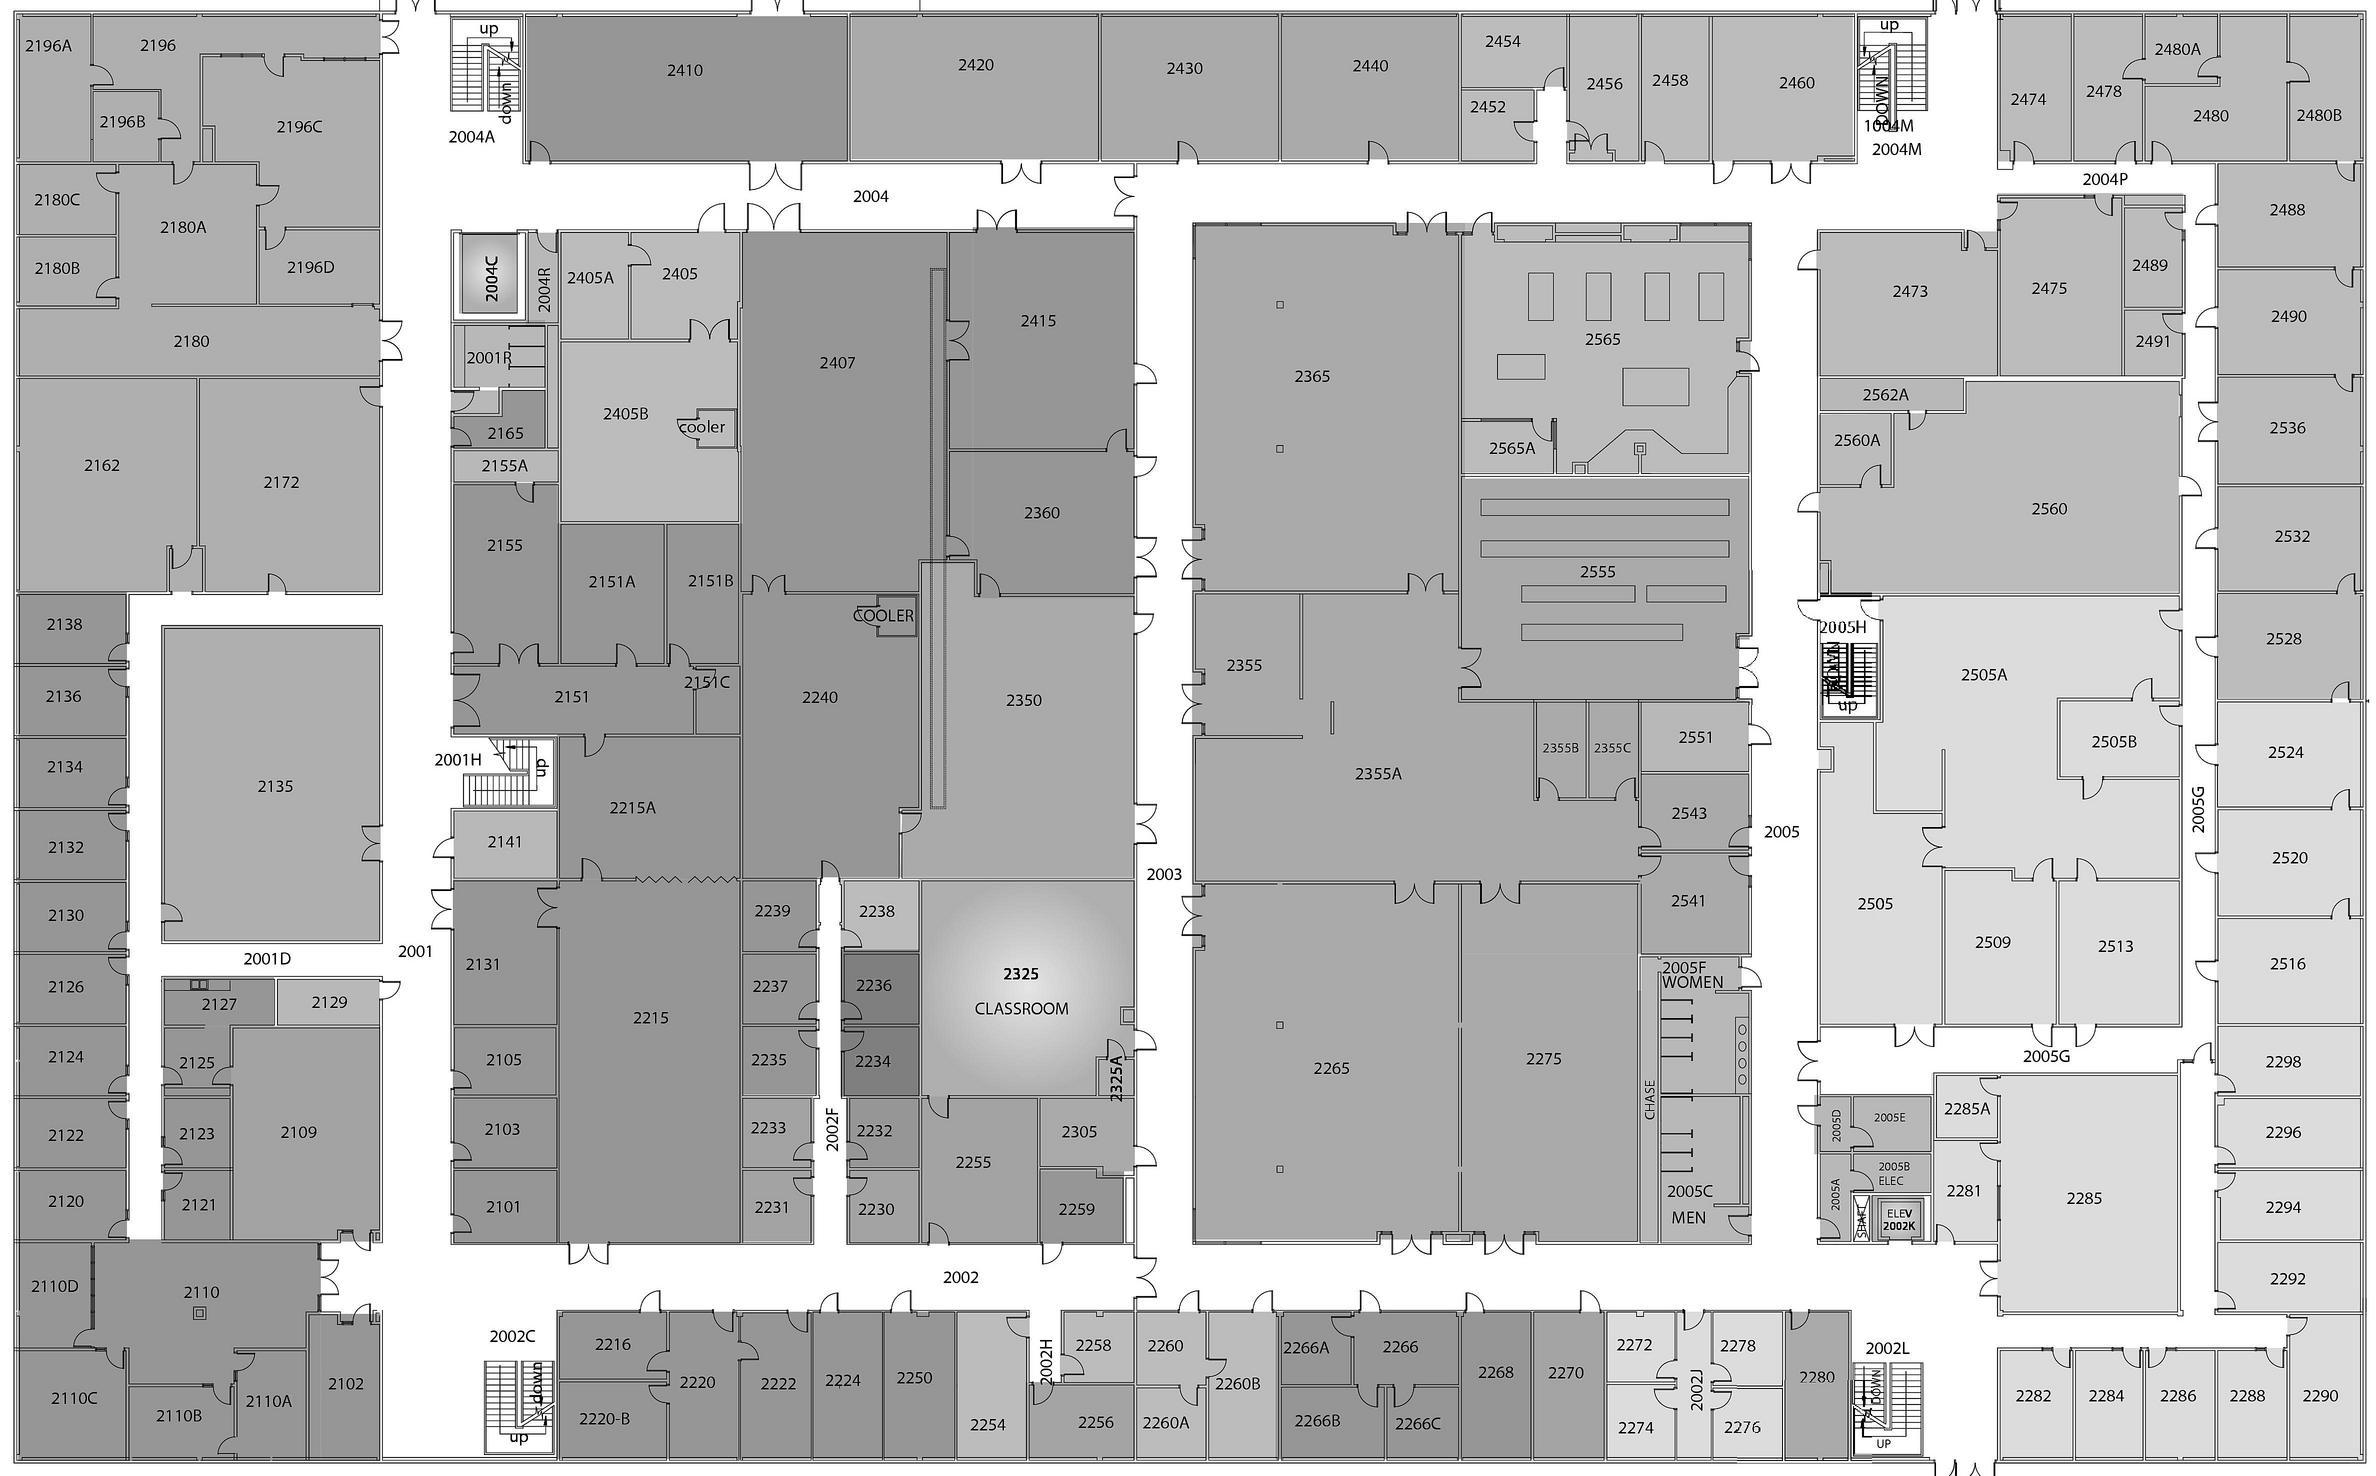 www/floormap/meb2fl-5.jpg